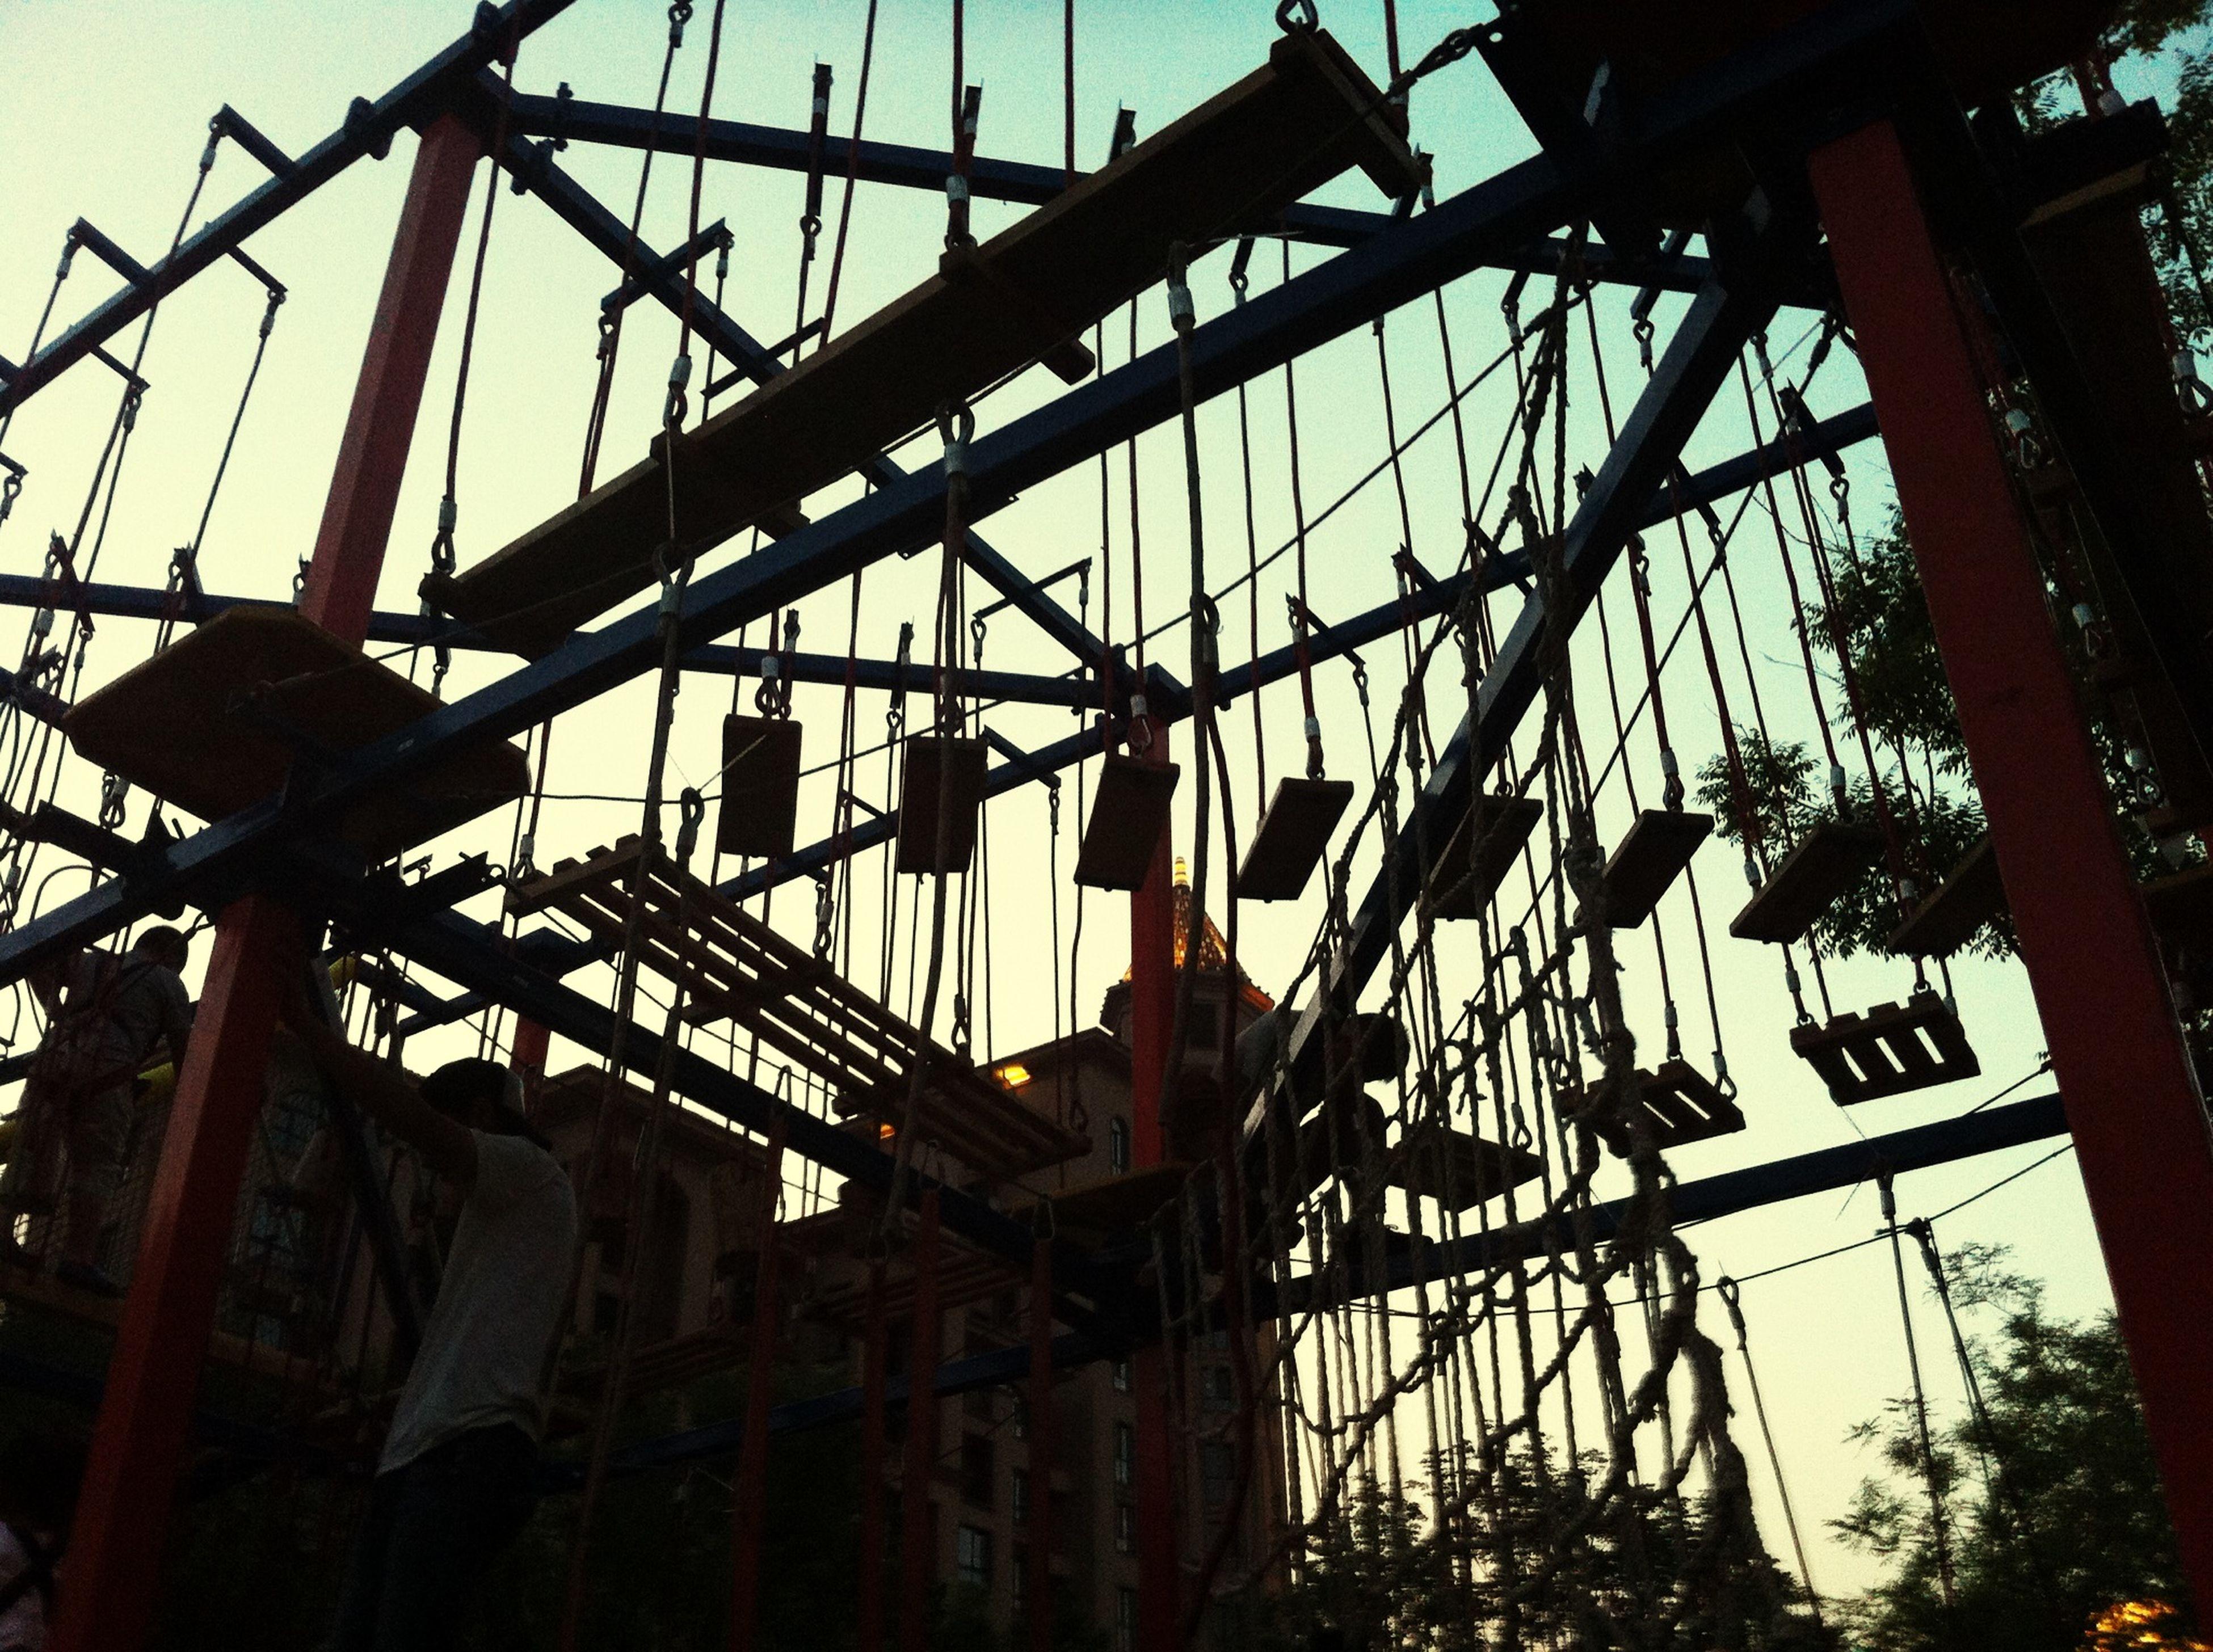 low angle view, metal, silhouette, sky, clear sky, metallic, built structure, amusement park, amusement park ride, architecture, connection, arts culture and entertainment, dusk, transportation, no people, sunset, outdoors, ferris wheel, day, electricity pylon